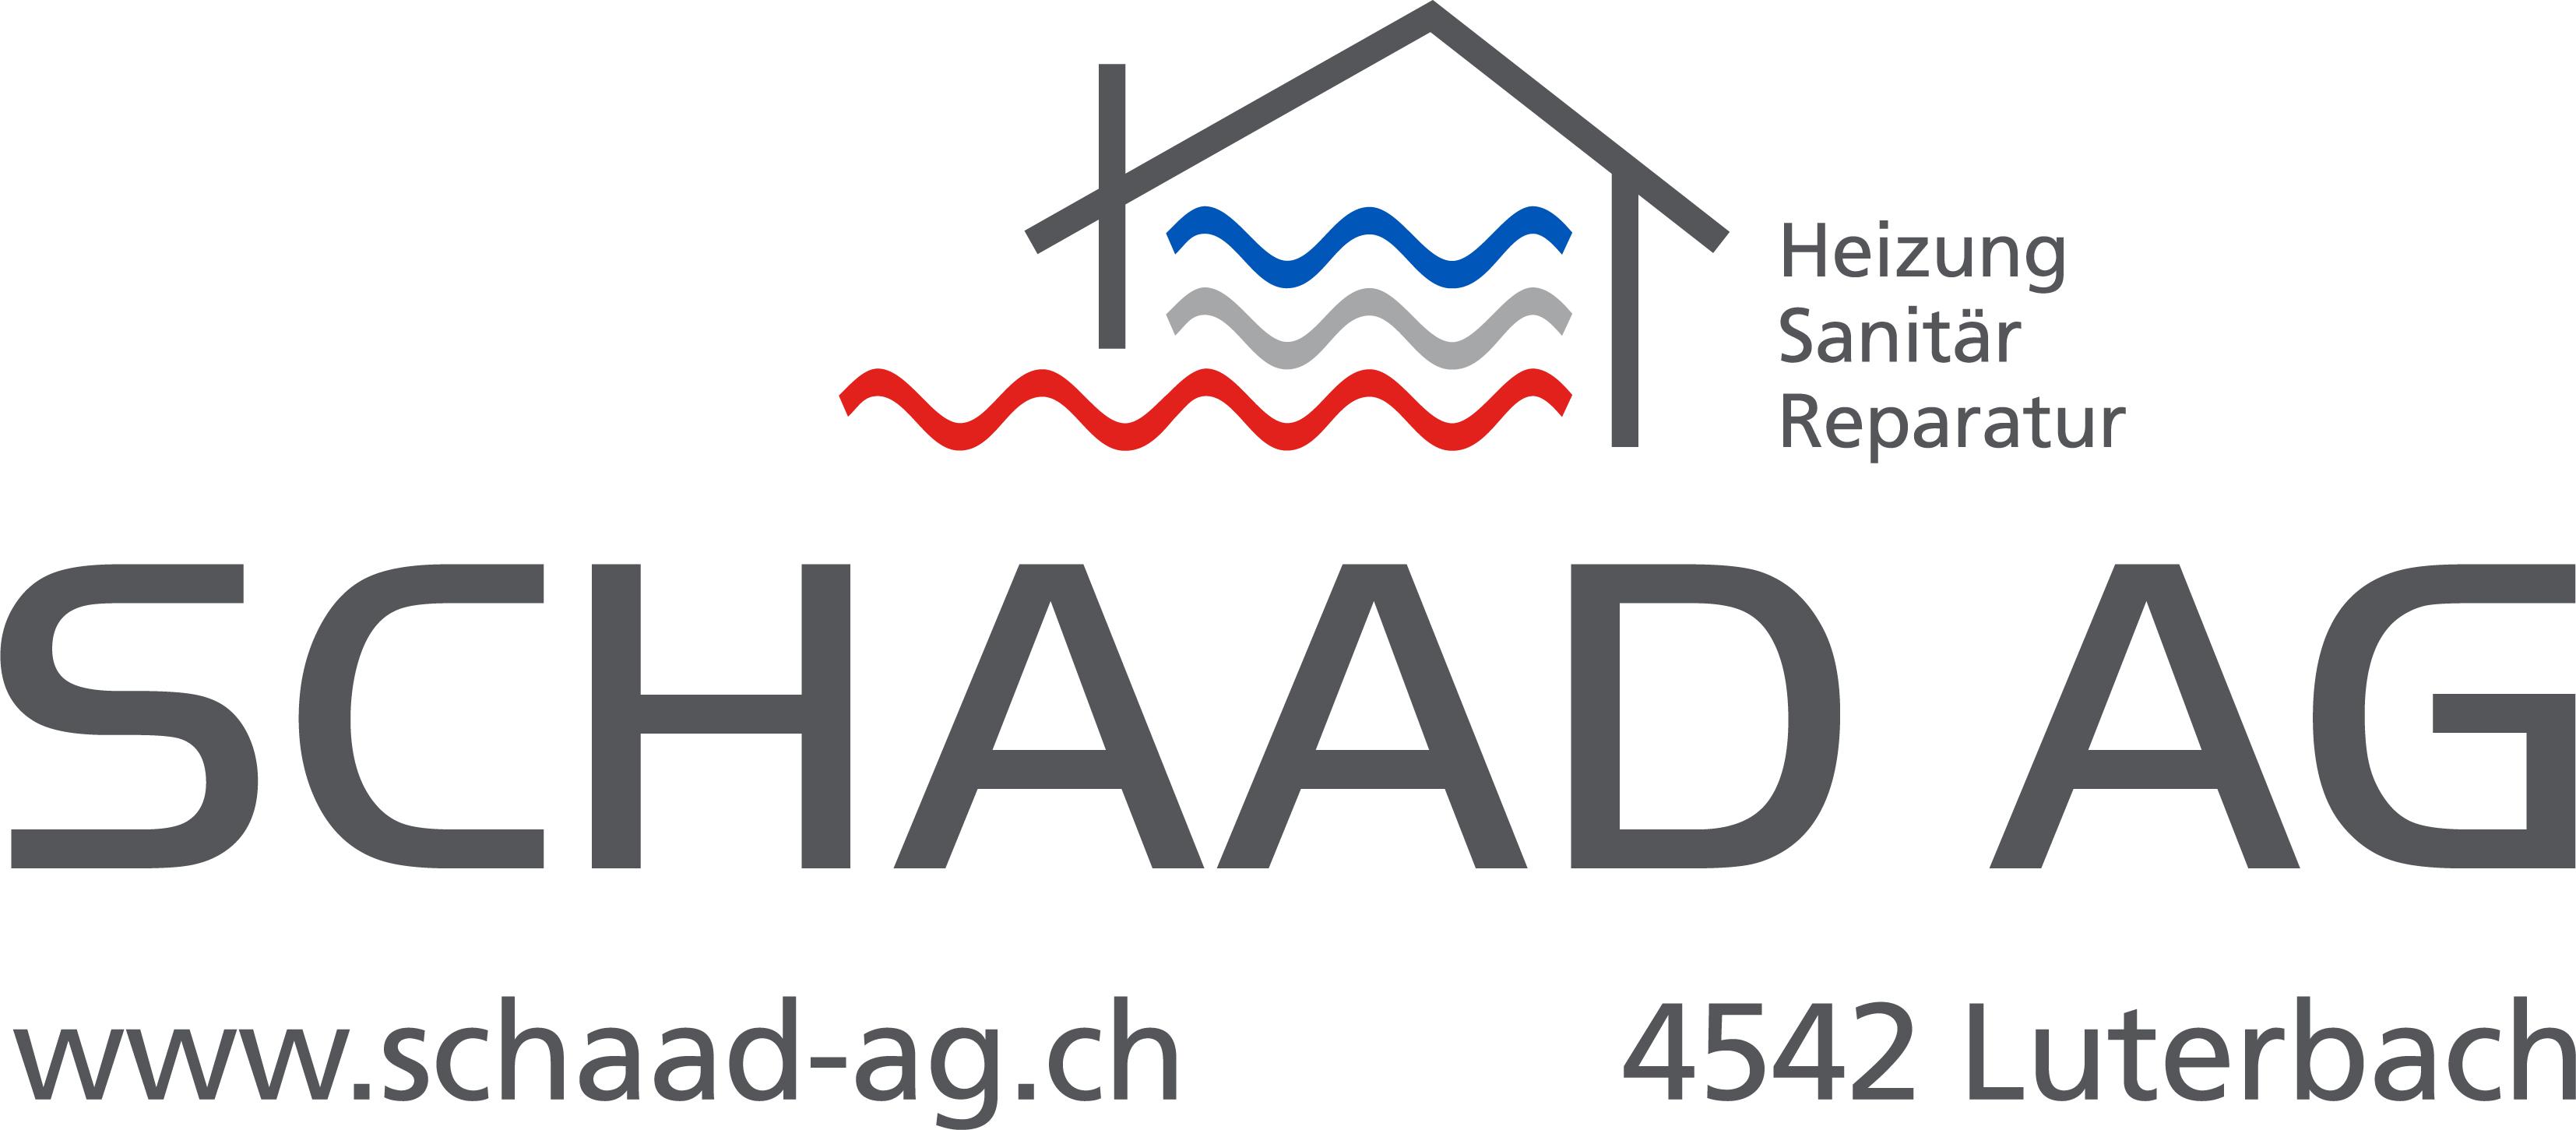 Schaad AG Luterbach